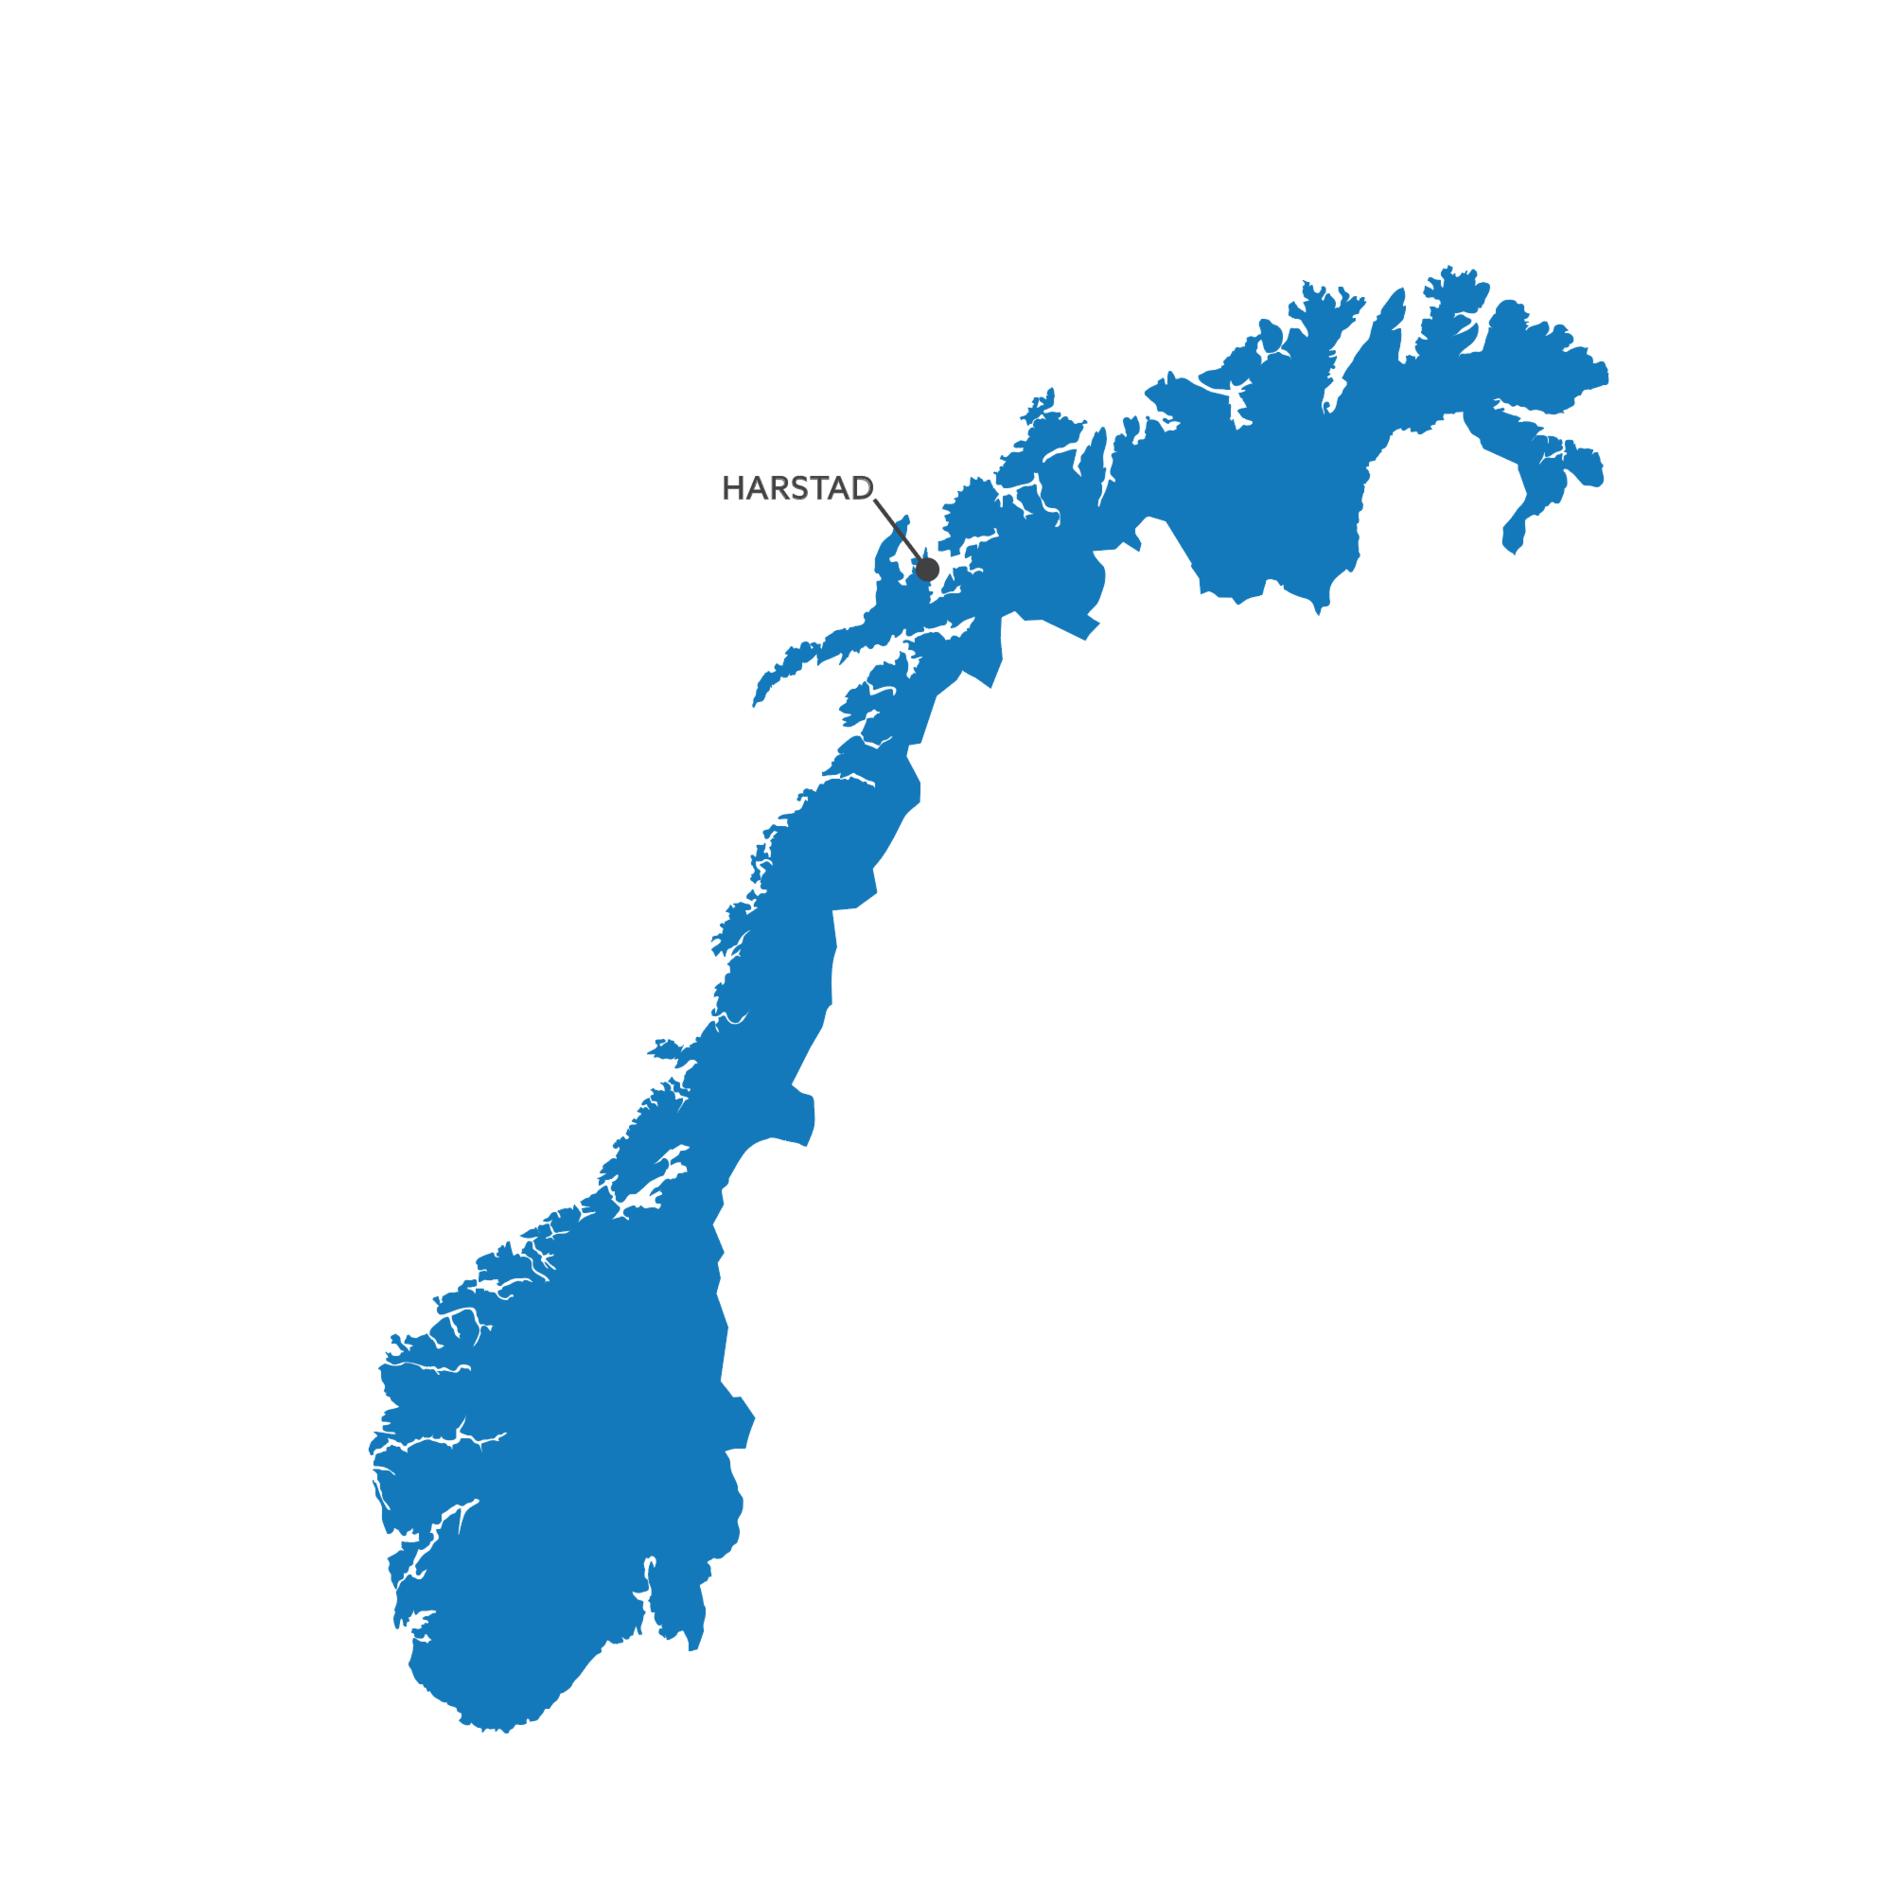 AltiBygg AS - BESØKSADRESSEKlubbveien 39406 HARSTADPOSTADRESSEPostboks 31529498 HARSTAD